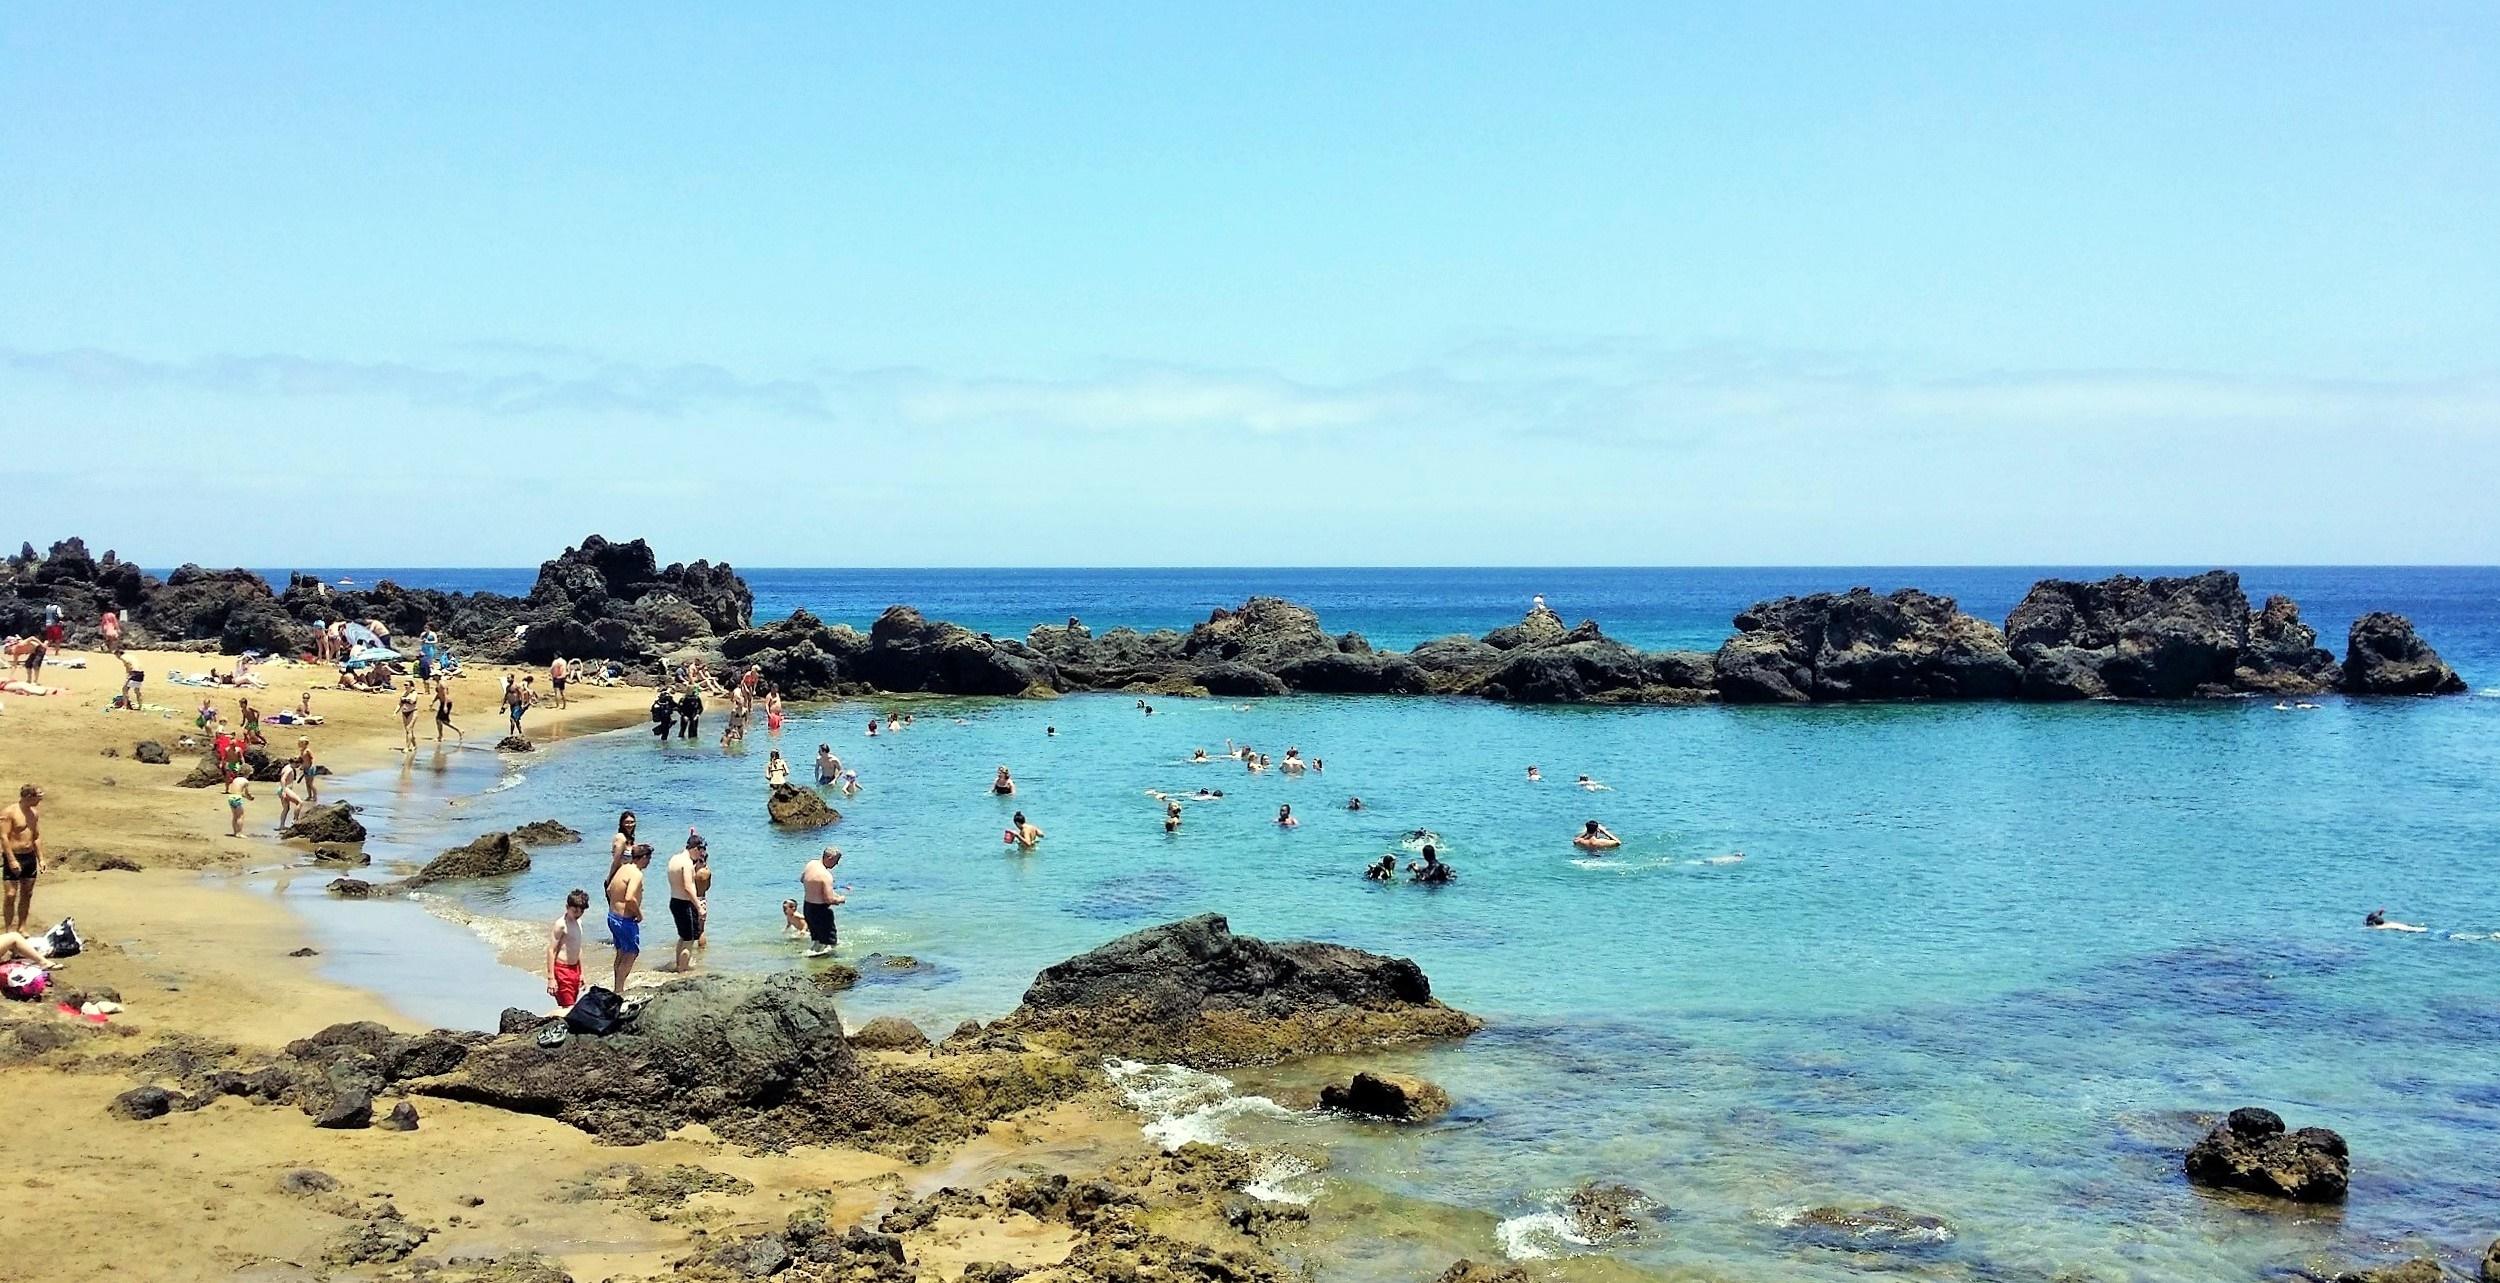 Playa Chica, Puerto del Carmen